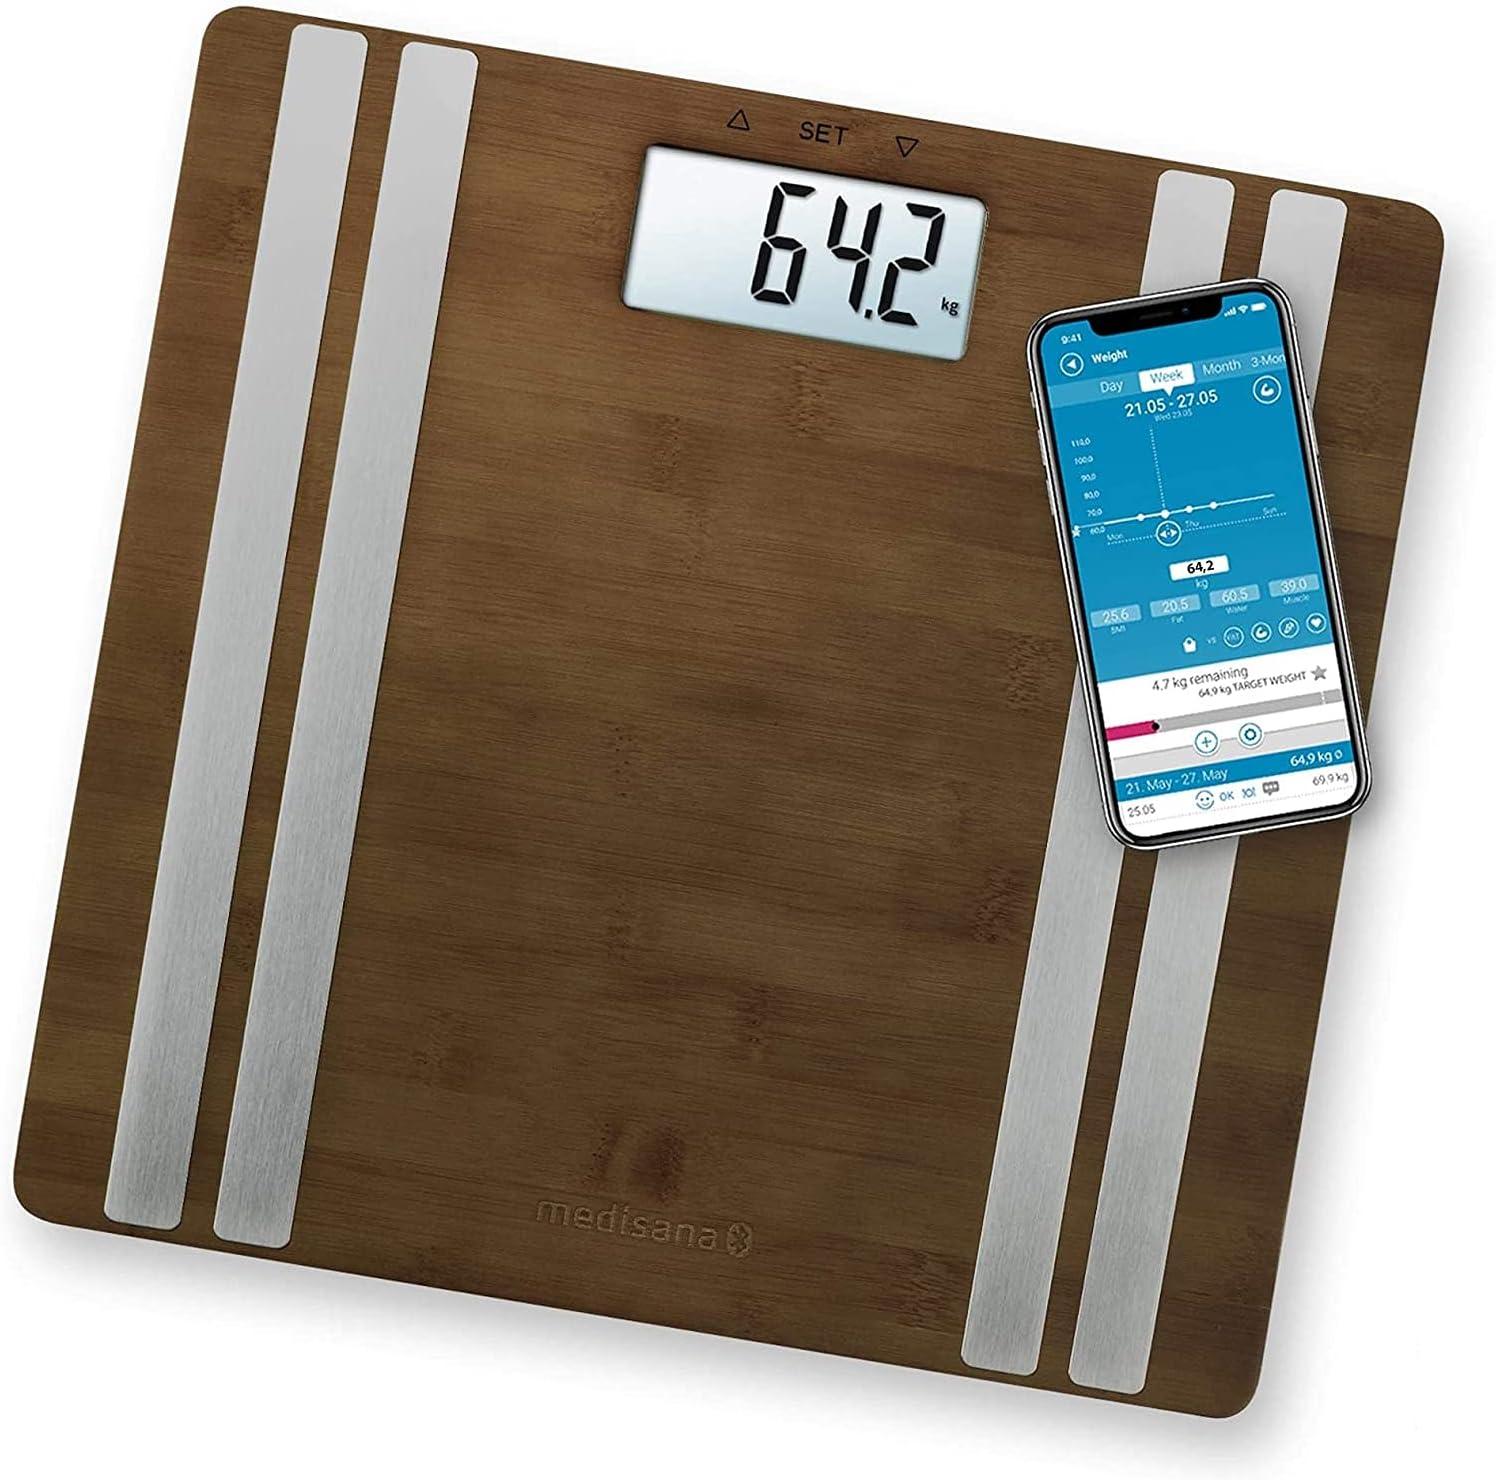 Medisana BS 552 connect báscula digital de bambú para análisis corporal hasta 180 kg, báscula personal para medir la grasa corporal, el agua corporal, báscula de grasa corporal con aplicación, Brown